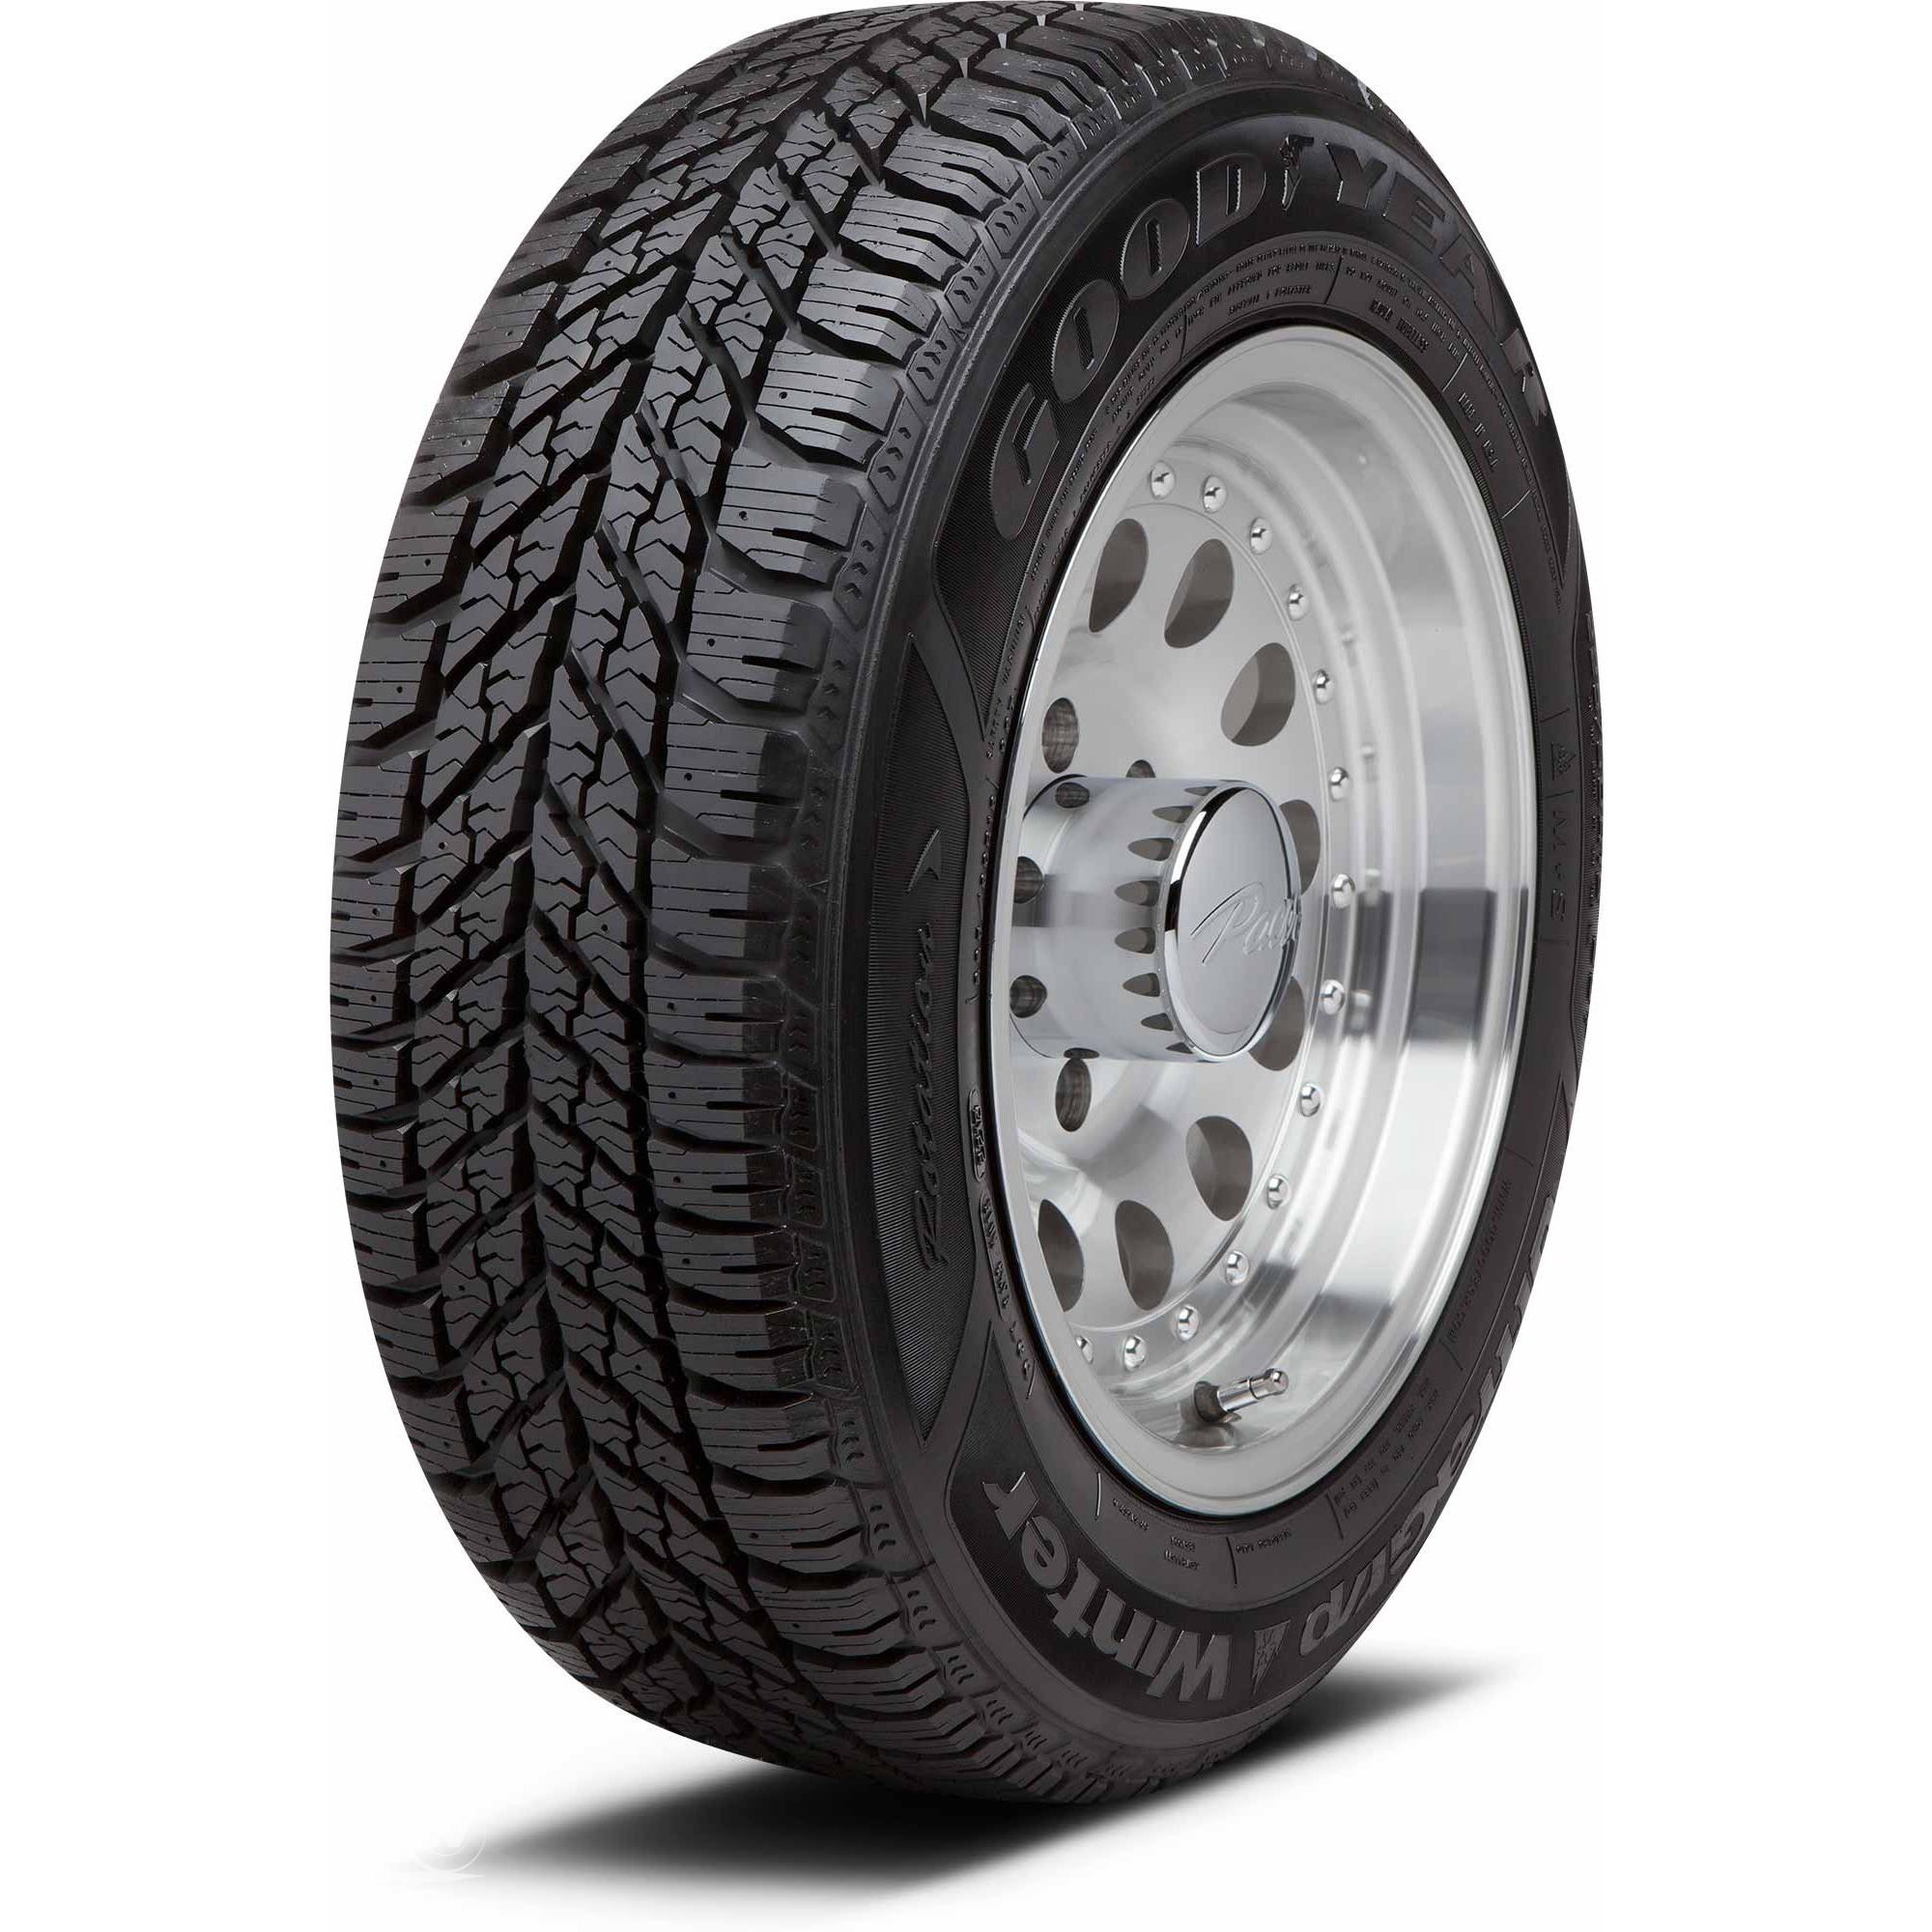 tires good year ultra grip 255 55 r18. Black Bedroom Furniture Sets. Home Design Ideas